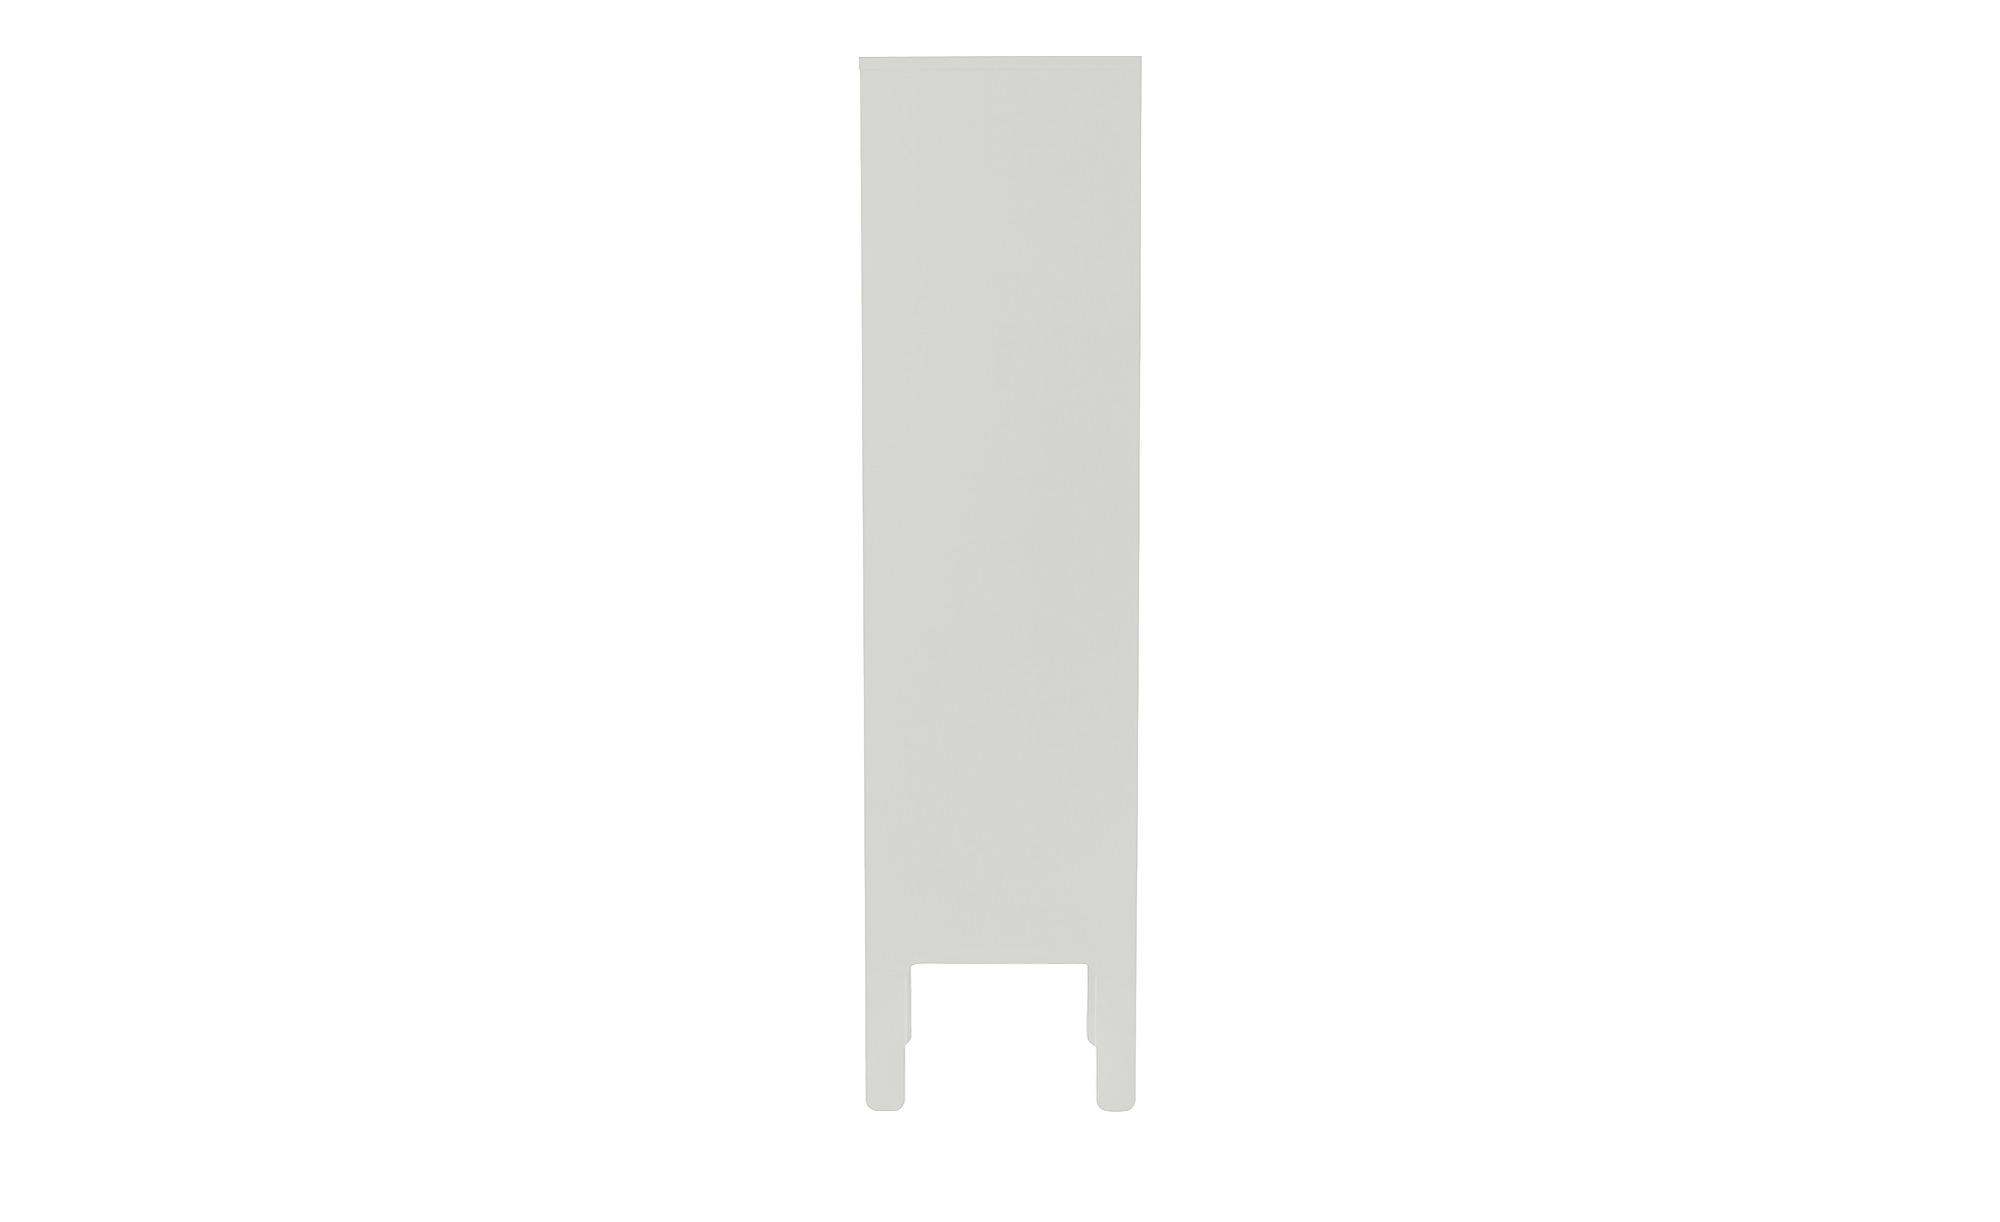 Highboard  Uno ¦ weiß ¦ Maße (cm): B: 40 H: 152 T: 40 Kommoden & Sideboards > Kommoden - Höffner